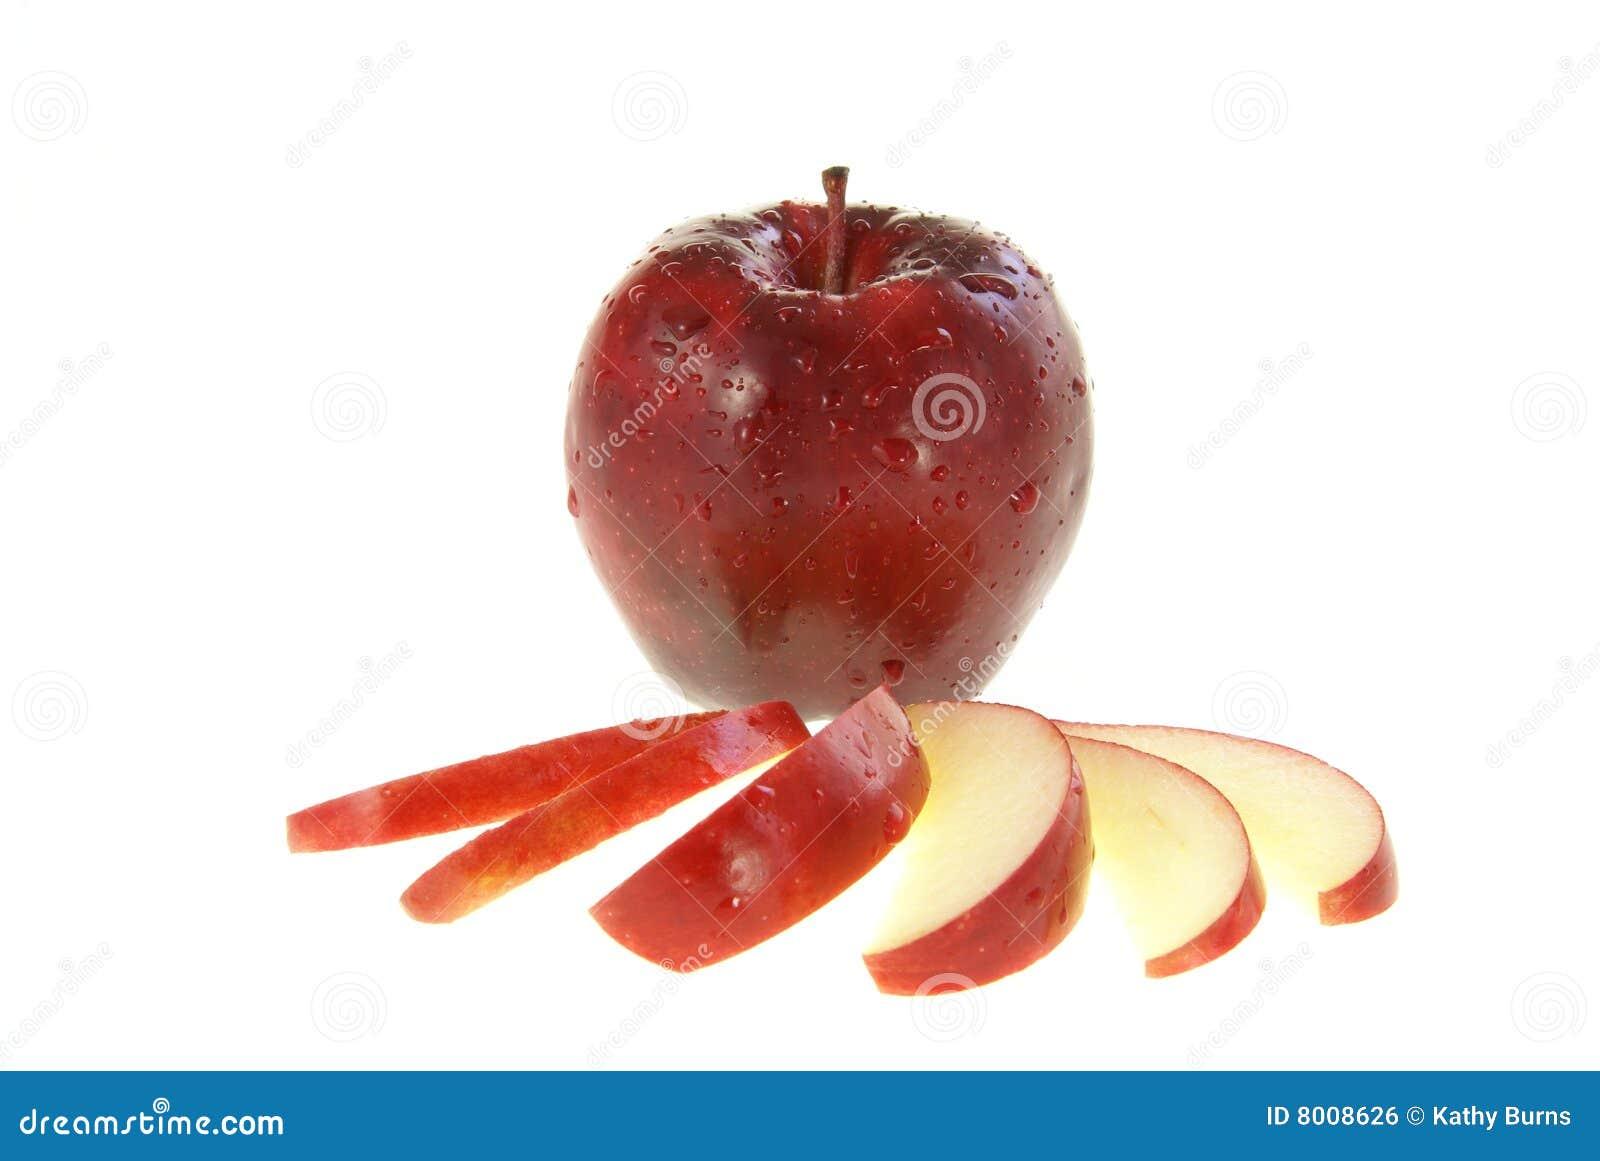 äppleskivor